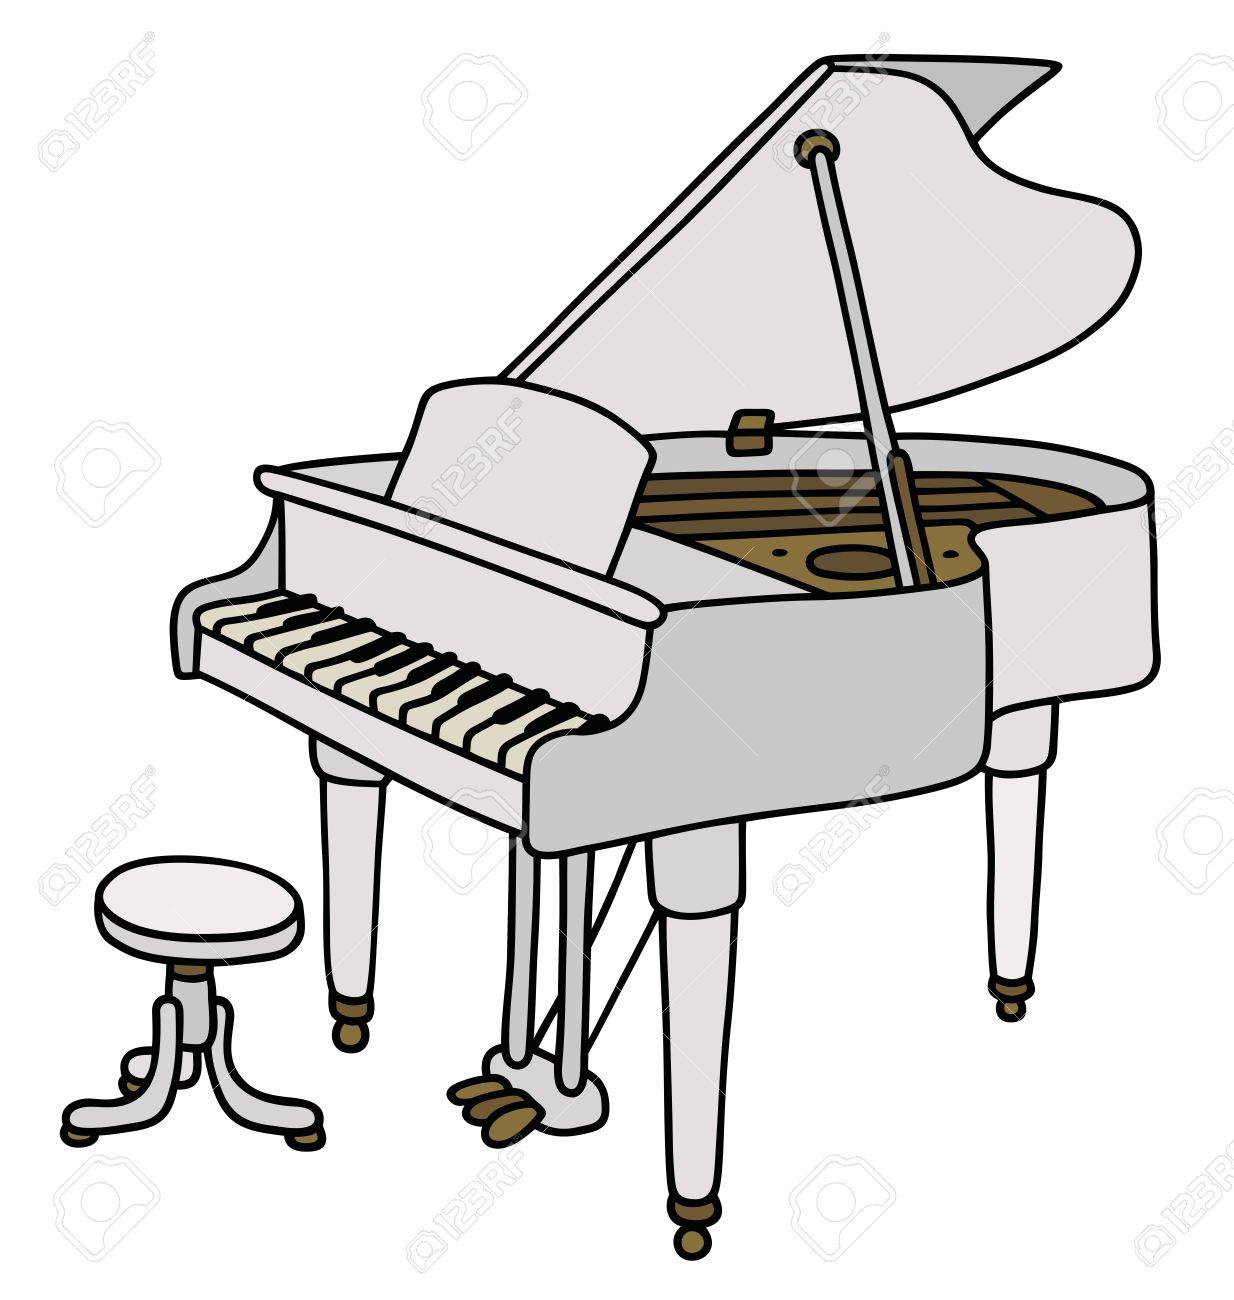 Dessin De Piano hand drawing of a classic white grand piano royalty free cliparts